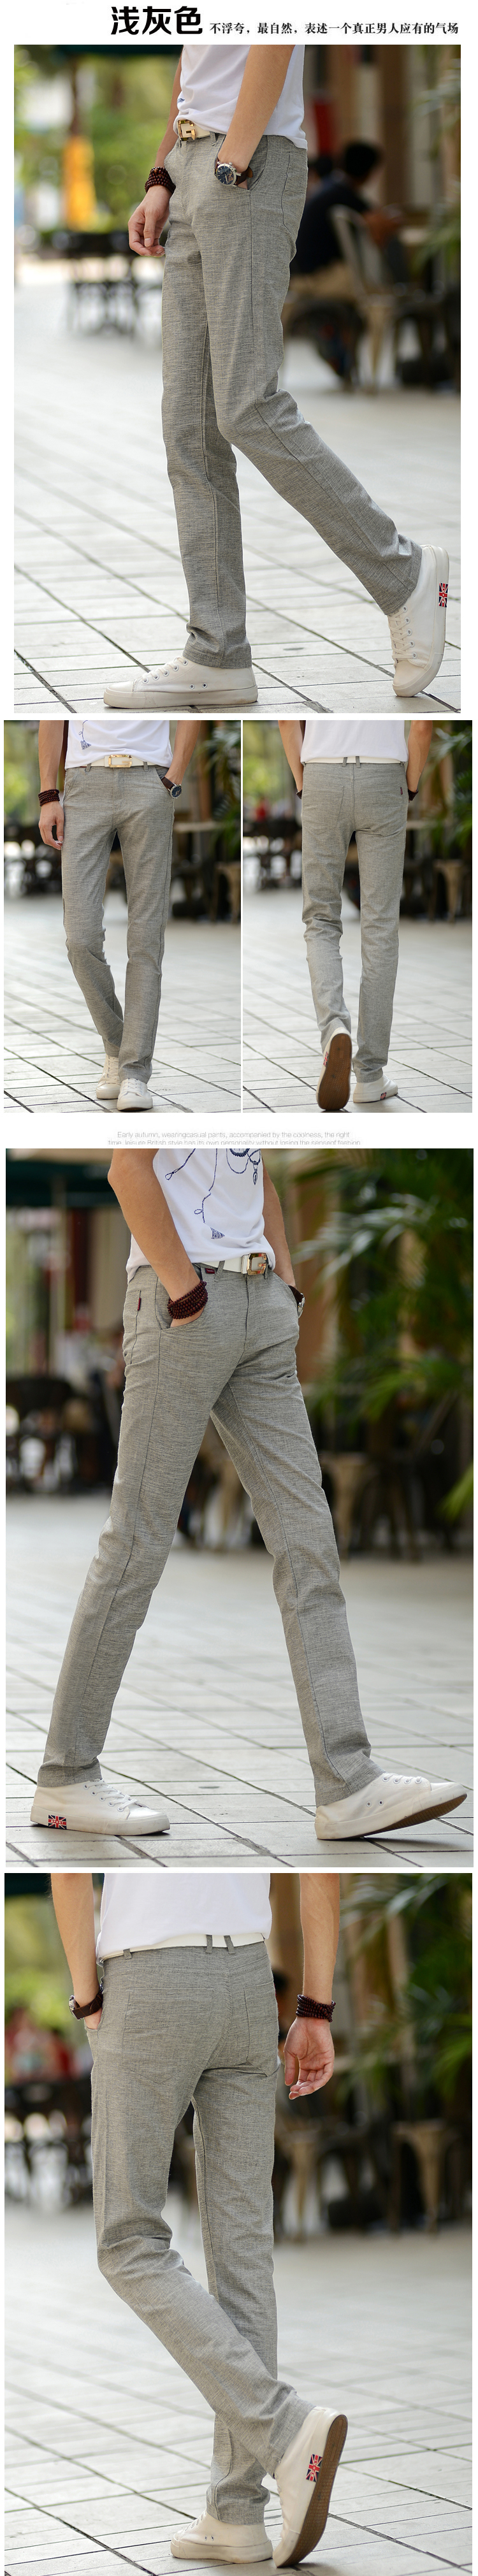 HTB1jVOThuuSBuNjy1Xcq6AYjFXav 2019 New Men Fashion Summer Korea Slim Fit Straight Linen Cotton Thin Business Trousers Pants Male Casual Pants Import Clothes